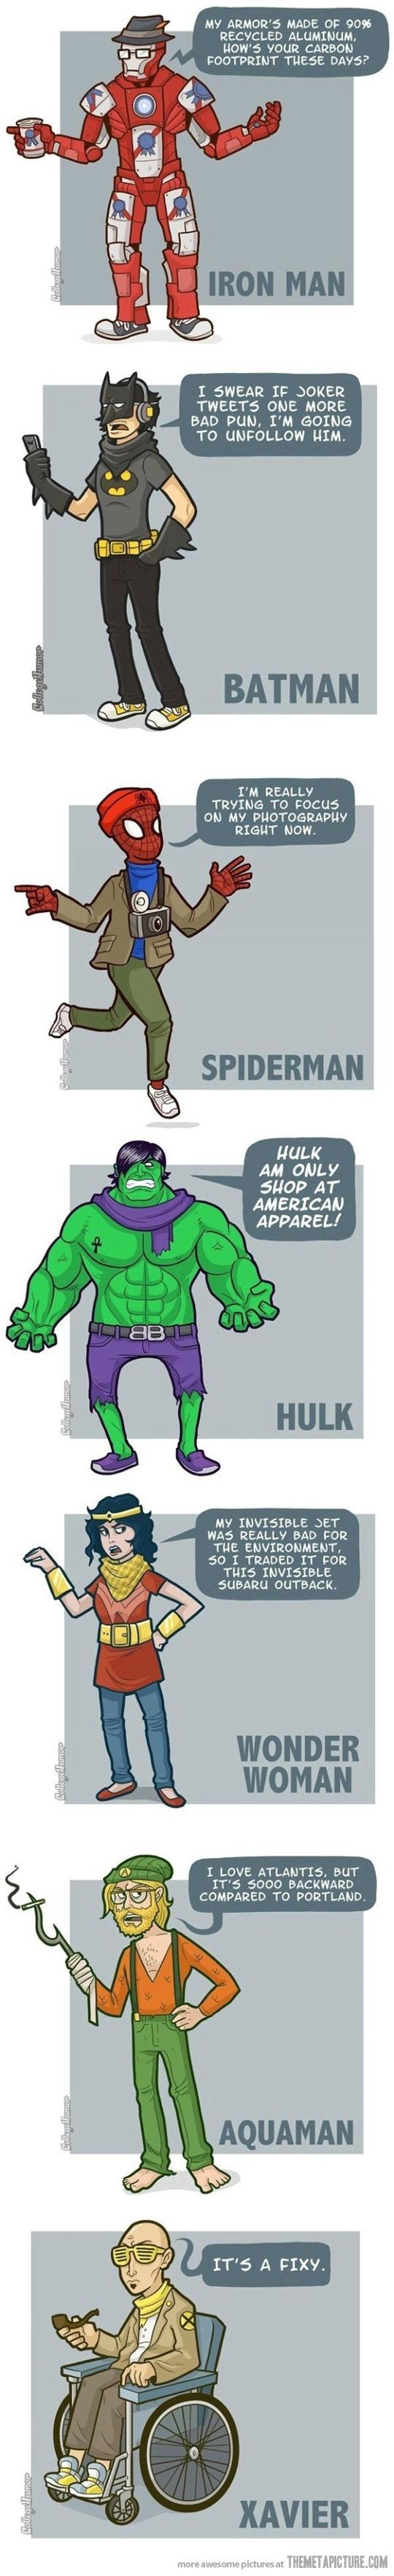 Hipster Superheroes!